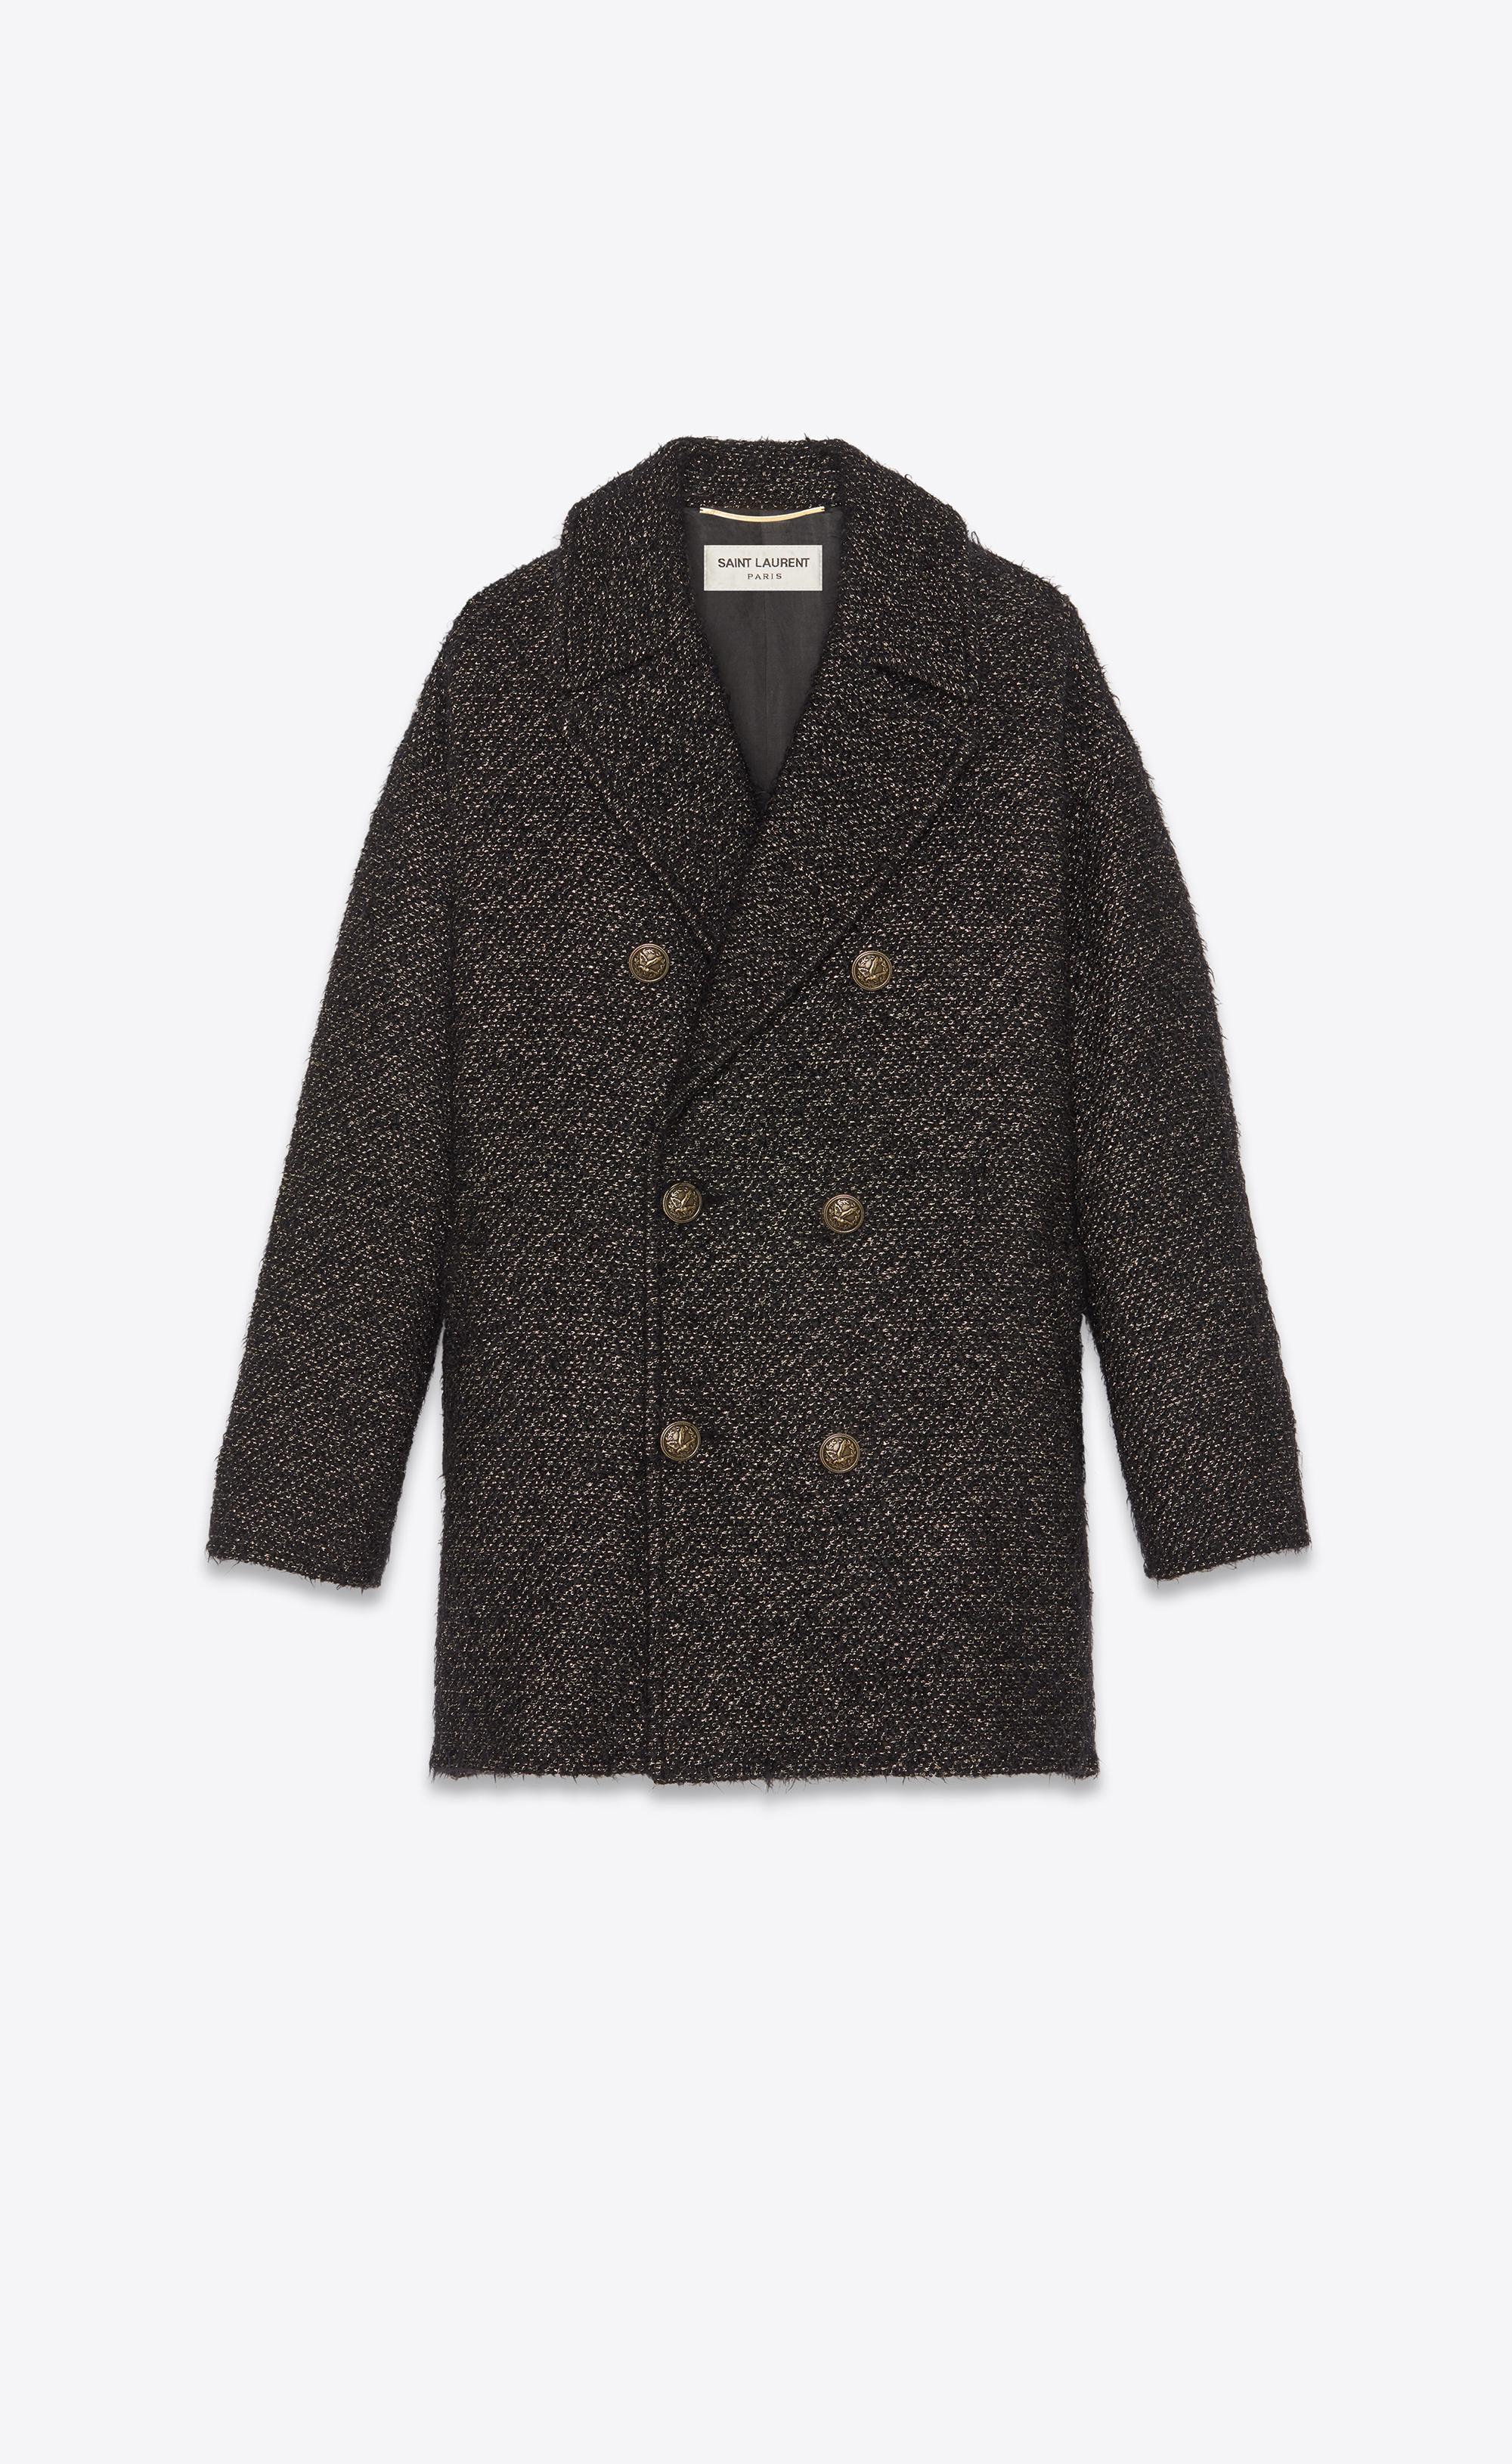 6bdc4a8985f Lyst - Saint Laurent Pea Coat in Black